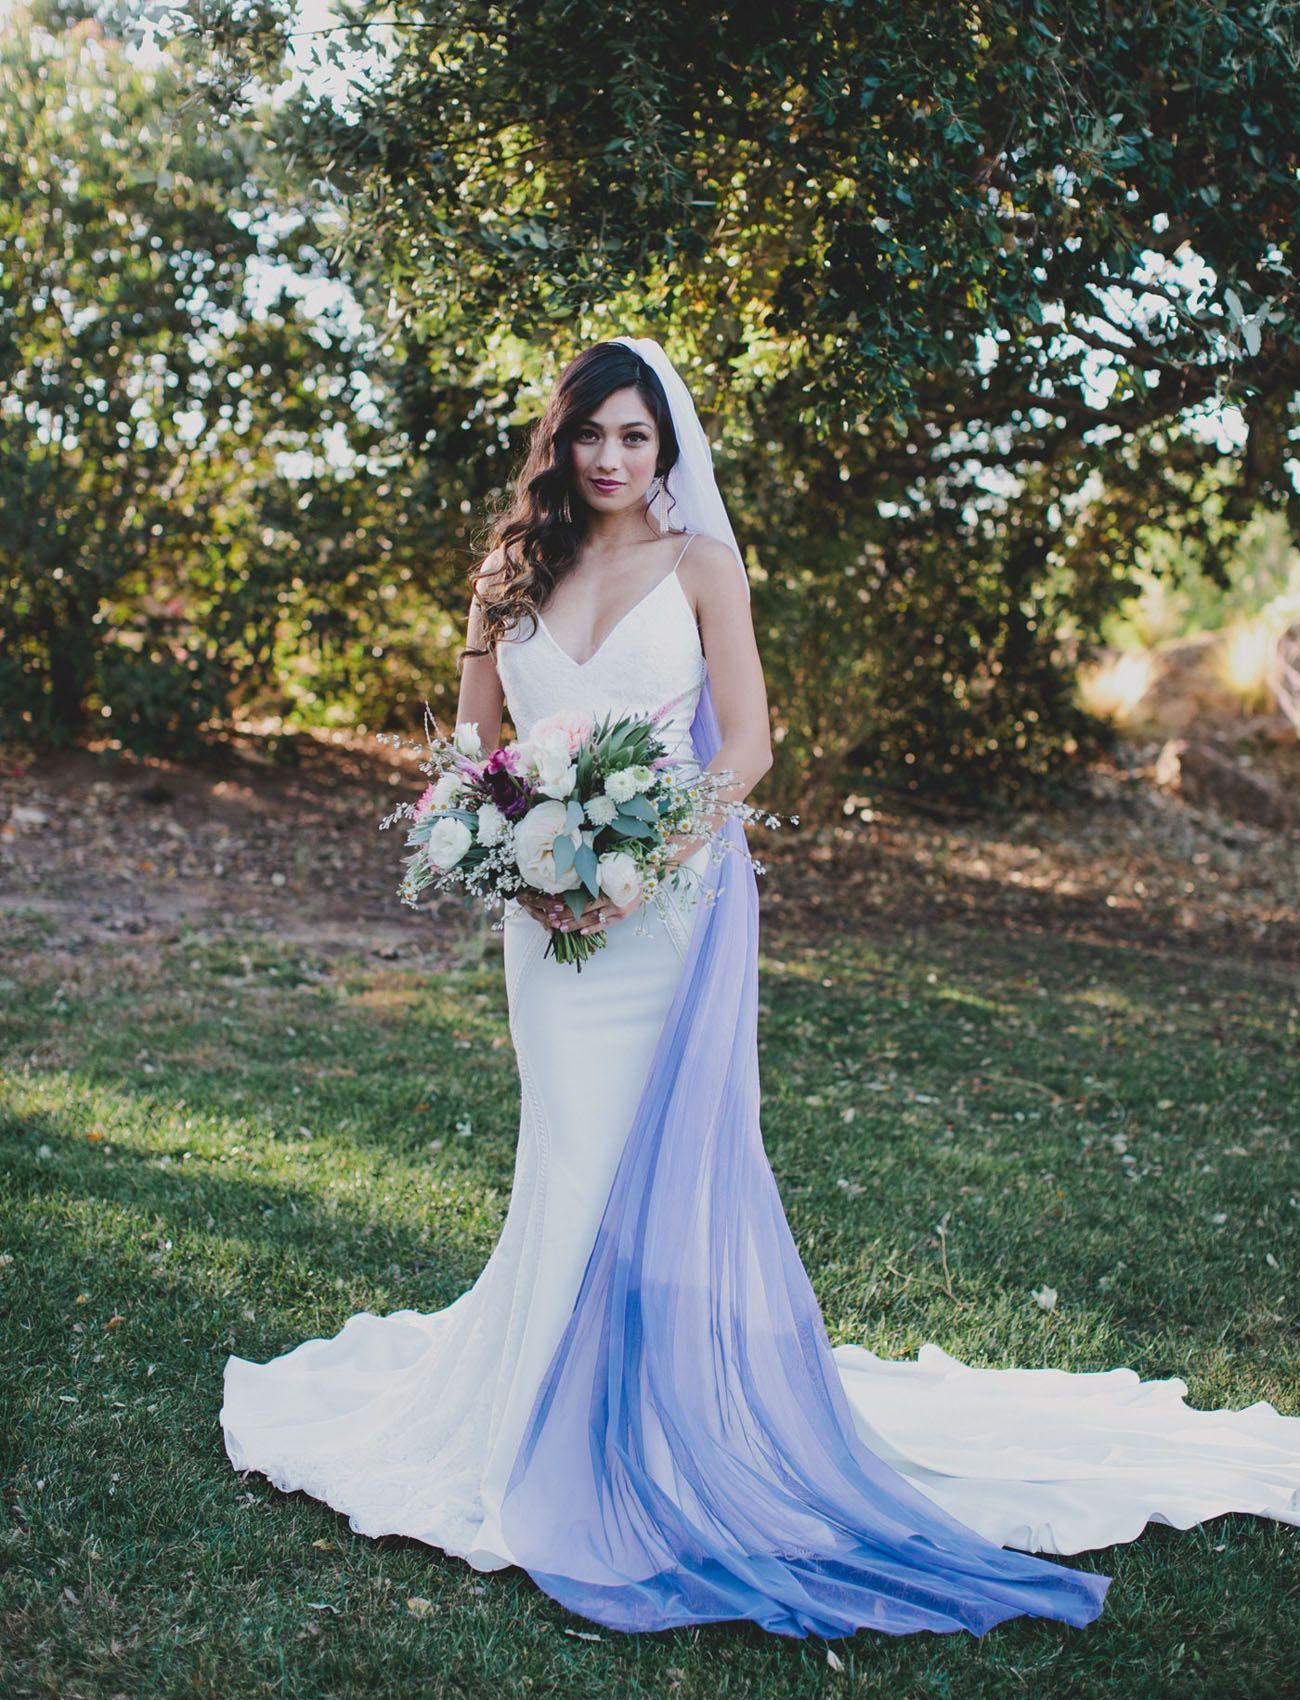 Diy Your Own Ultra Violet Veil Green Wedding Shoes Diy Wedding Shoes Bridesmaid Dresses Boho Wedding Dresses [ 1700 x 1300 Pixel ]